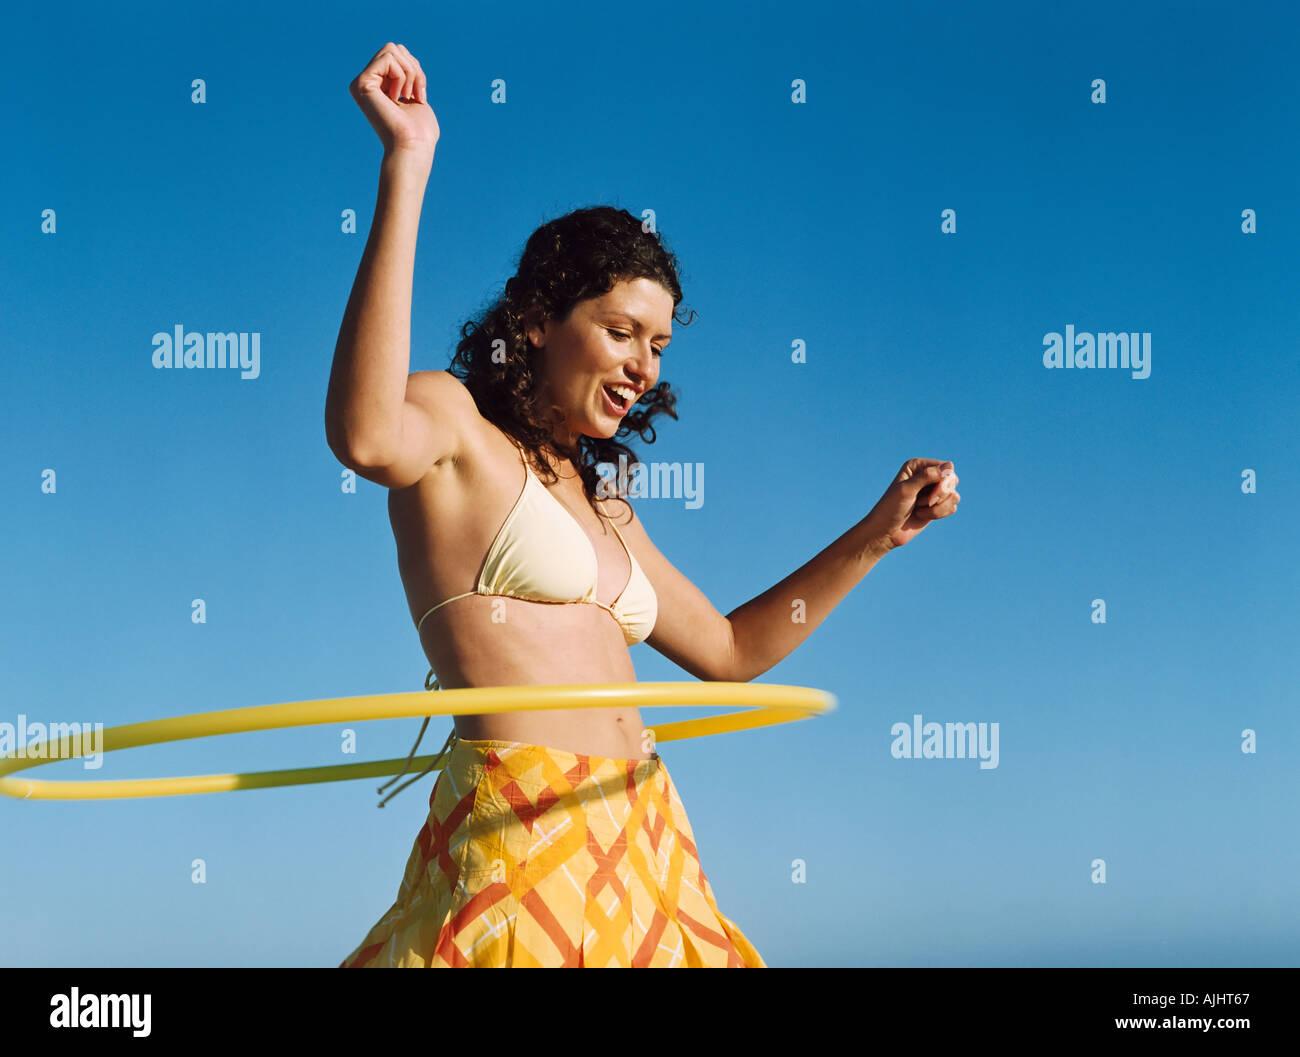 Woman playing with hula hoop - Stock Image